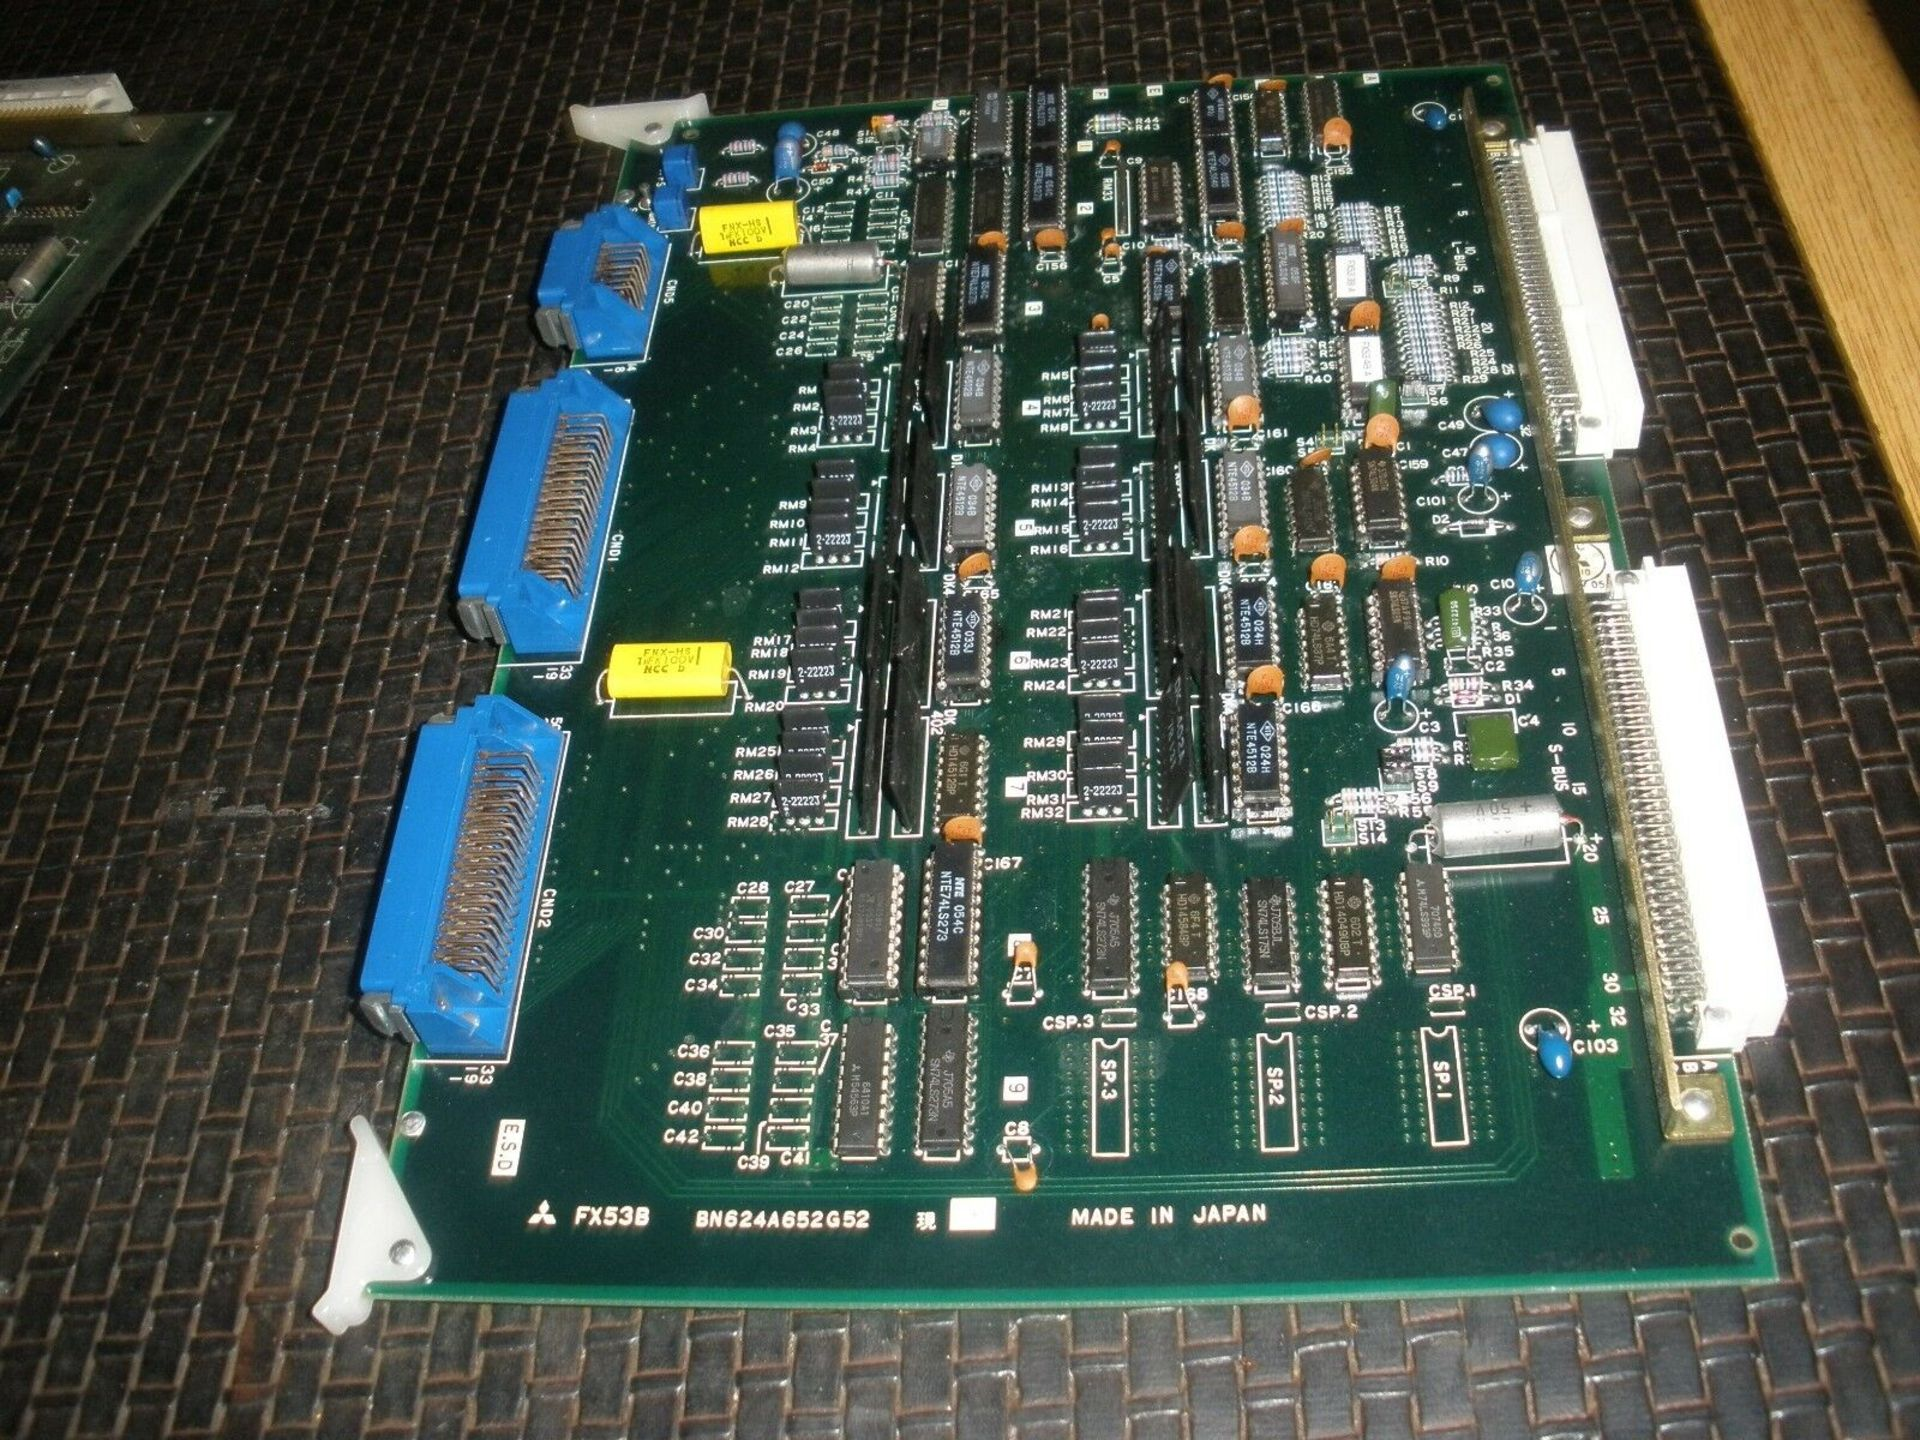 Mitsubishi Servo Board BN624A652G52